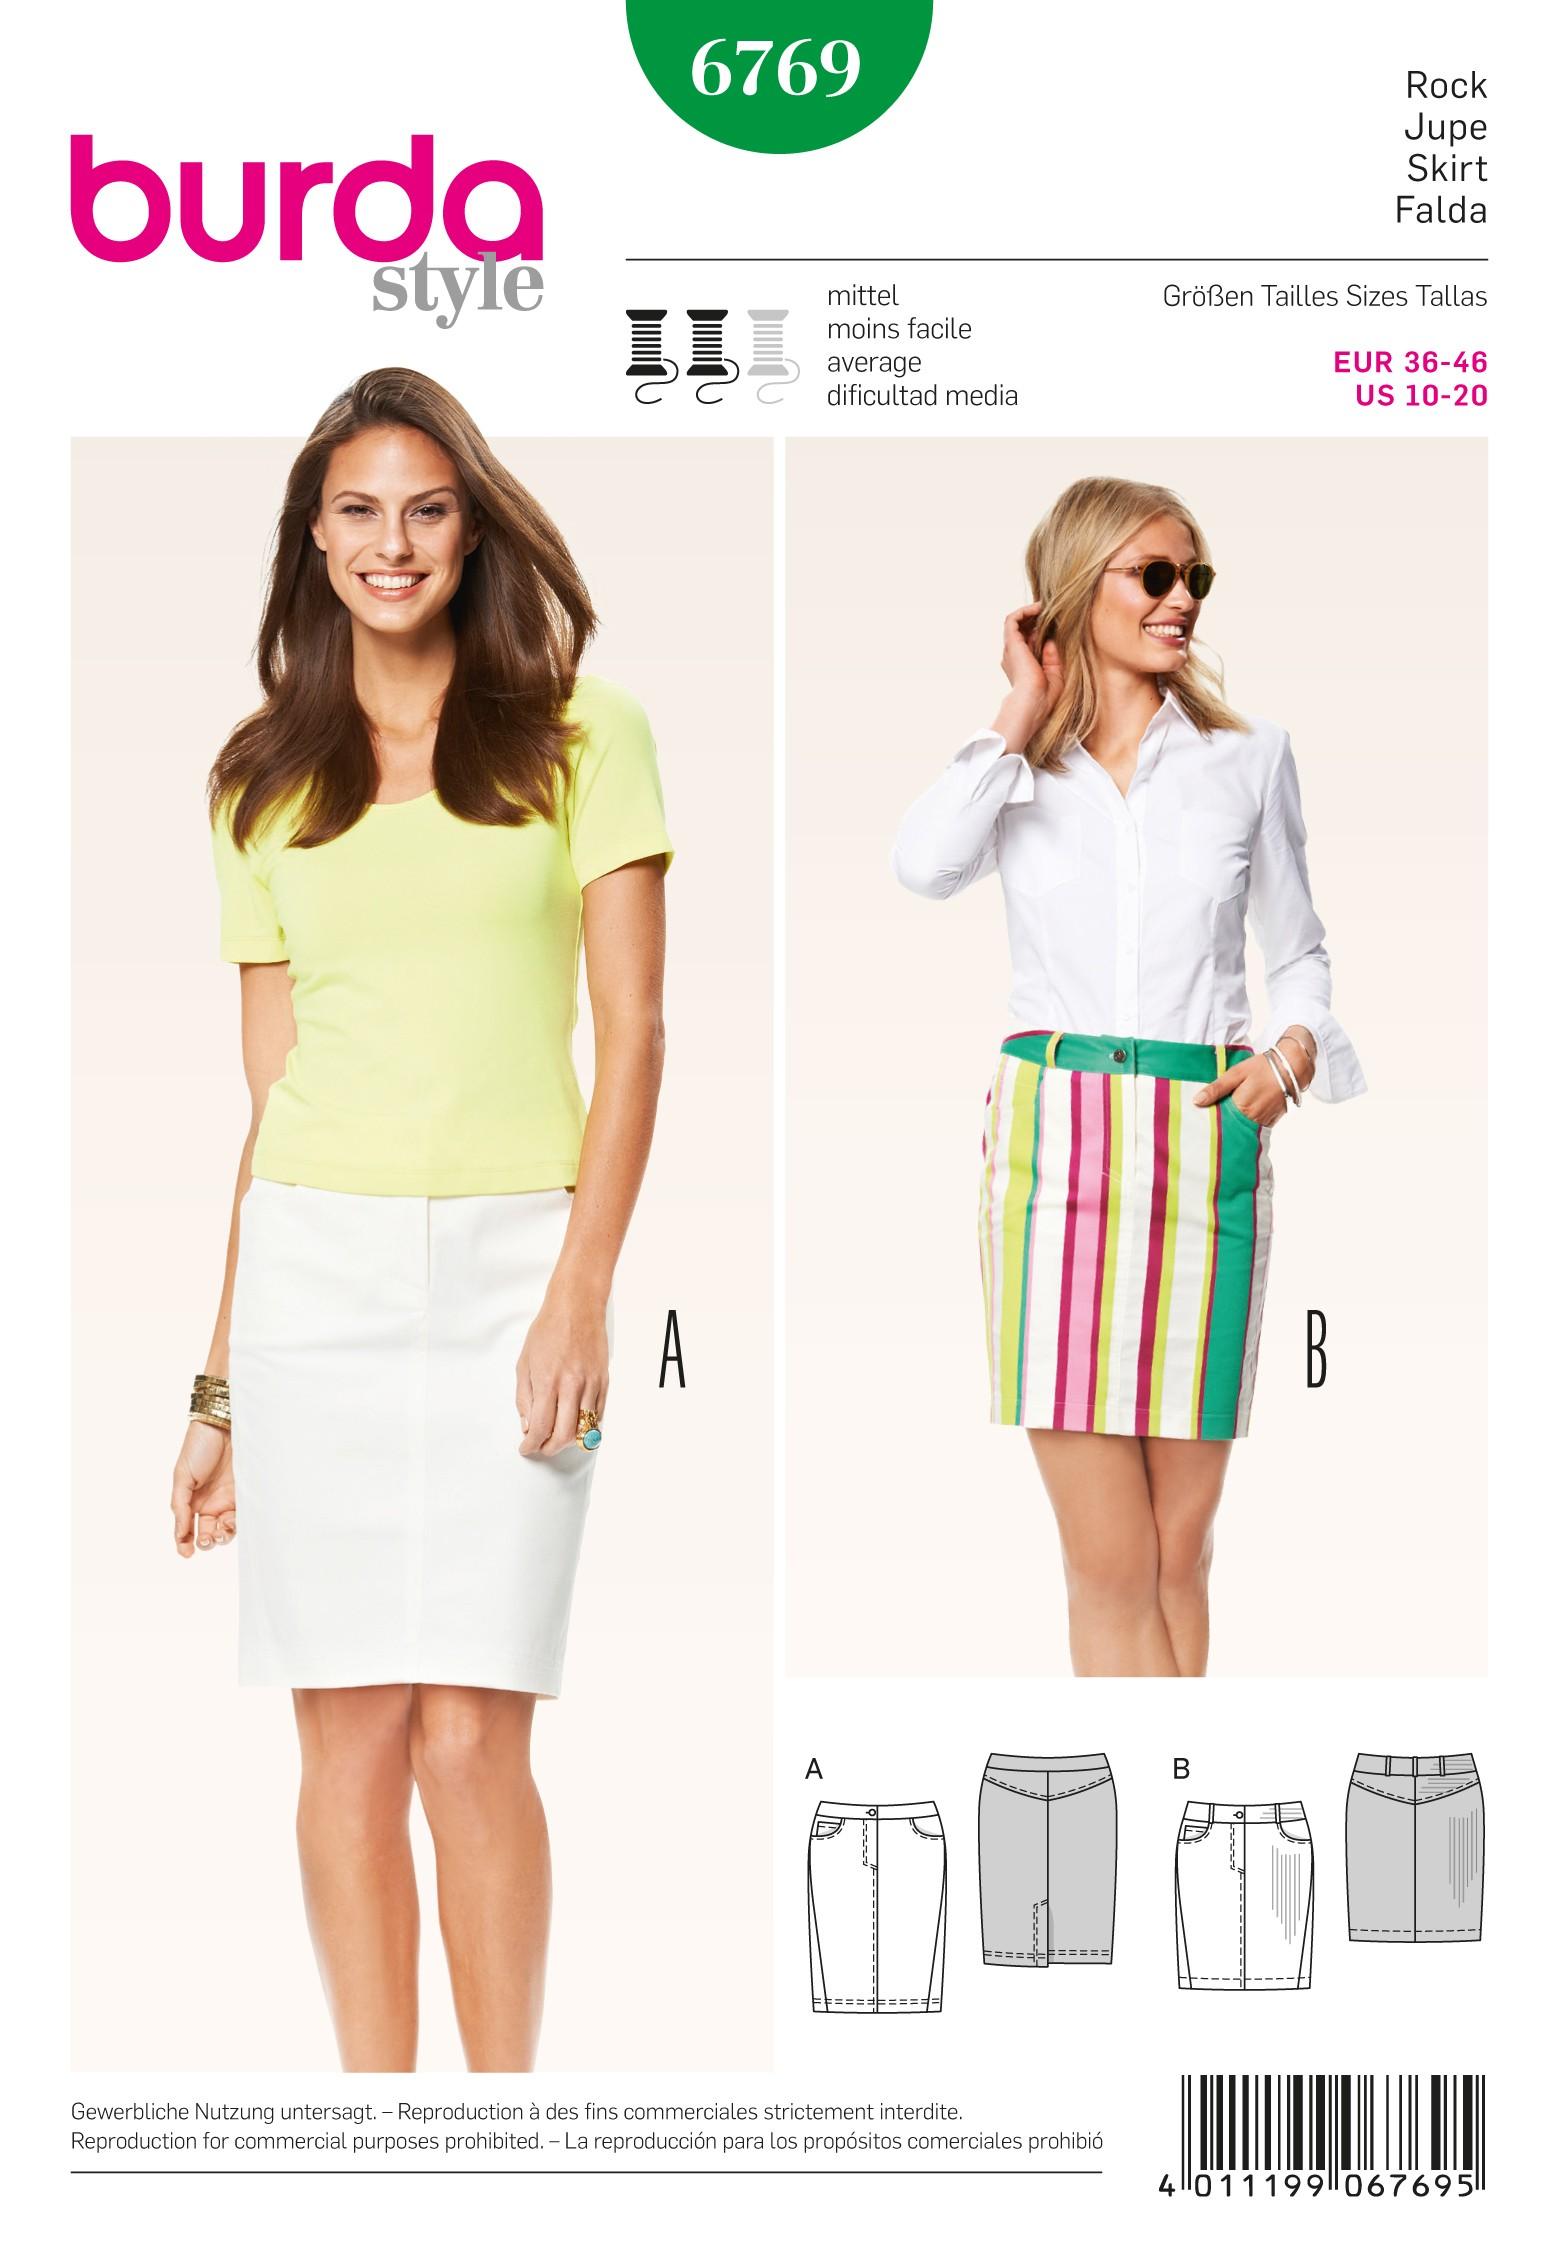 Burda Style Misses' Midi Formal Summer Skirt Sewing Pattern 6769